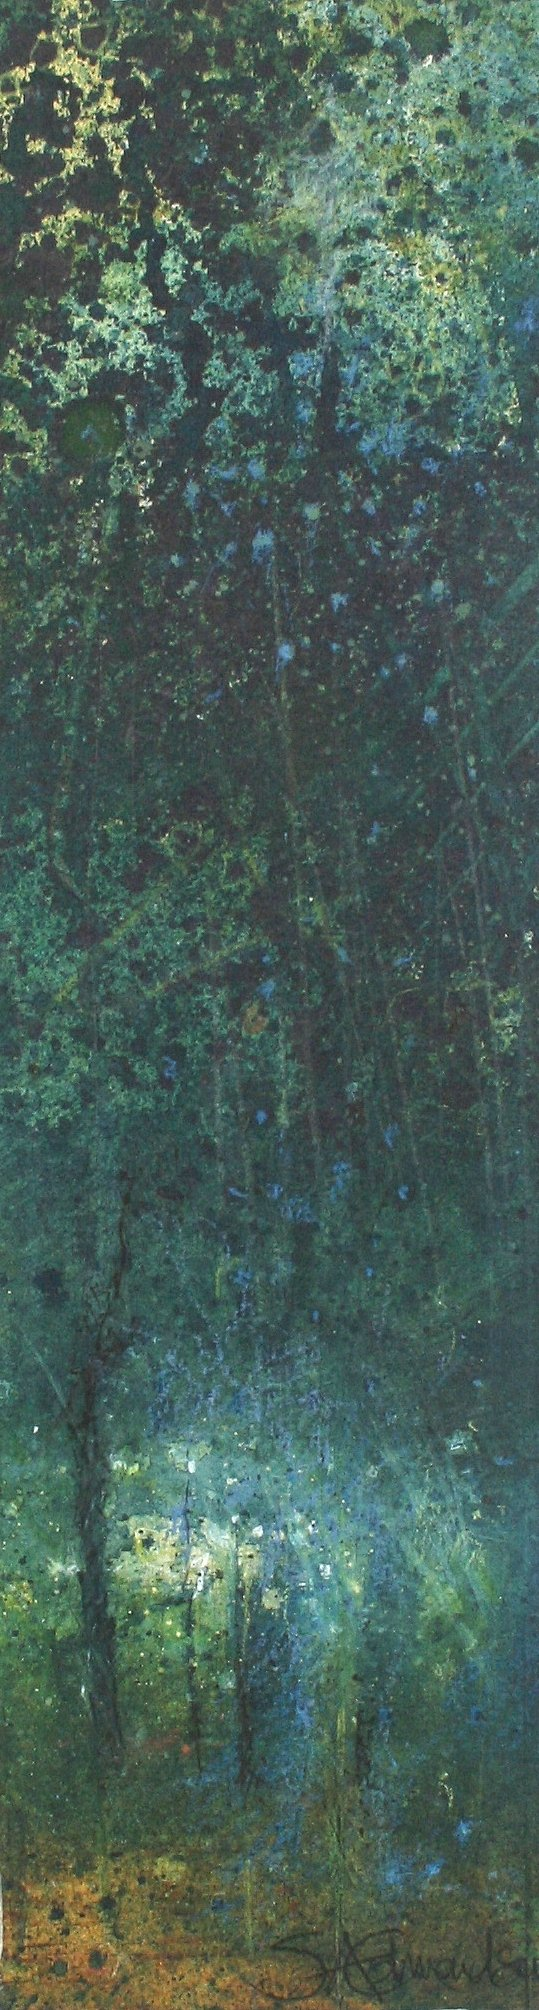 Through to Where the Blue Shines (10 x 21cm) (002)